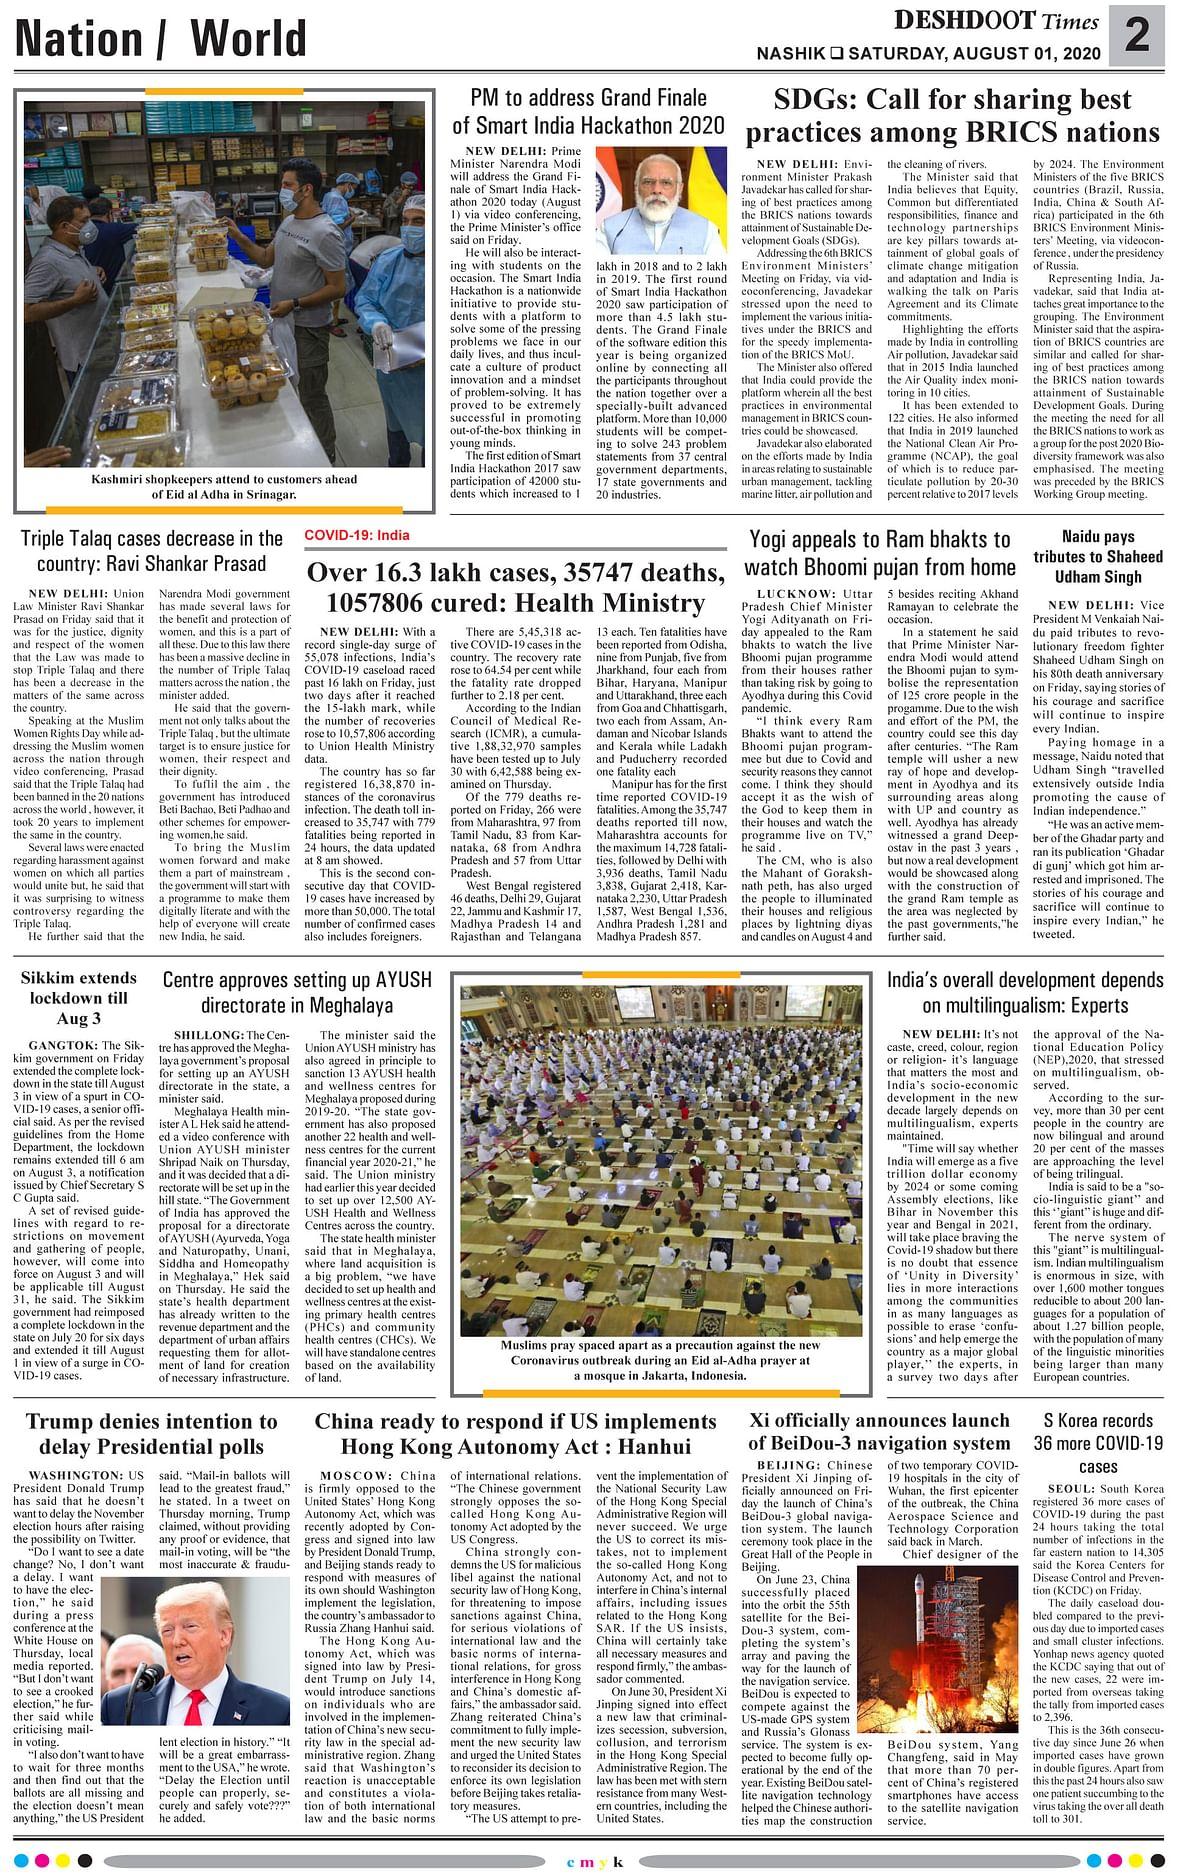 Deshdoot Times E Paper, 1 August 2020